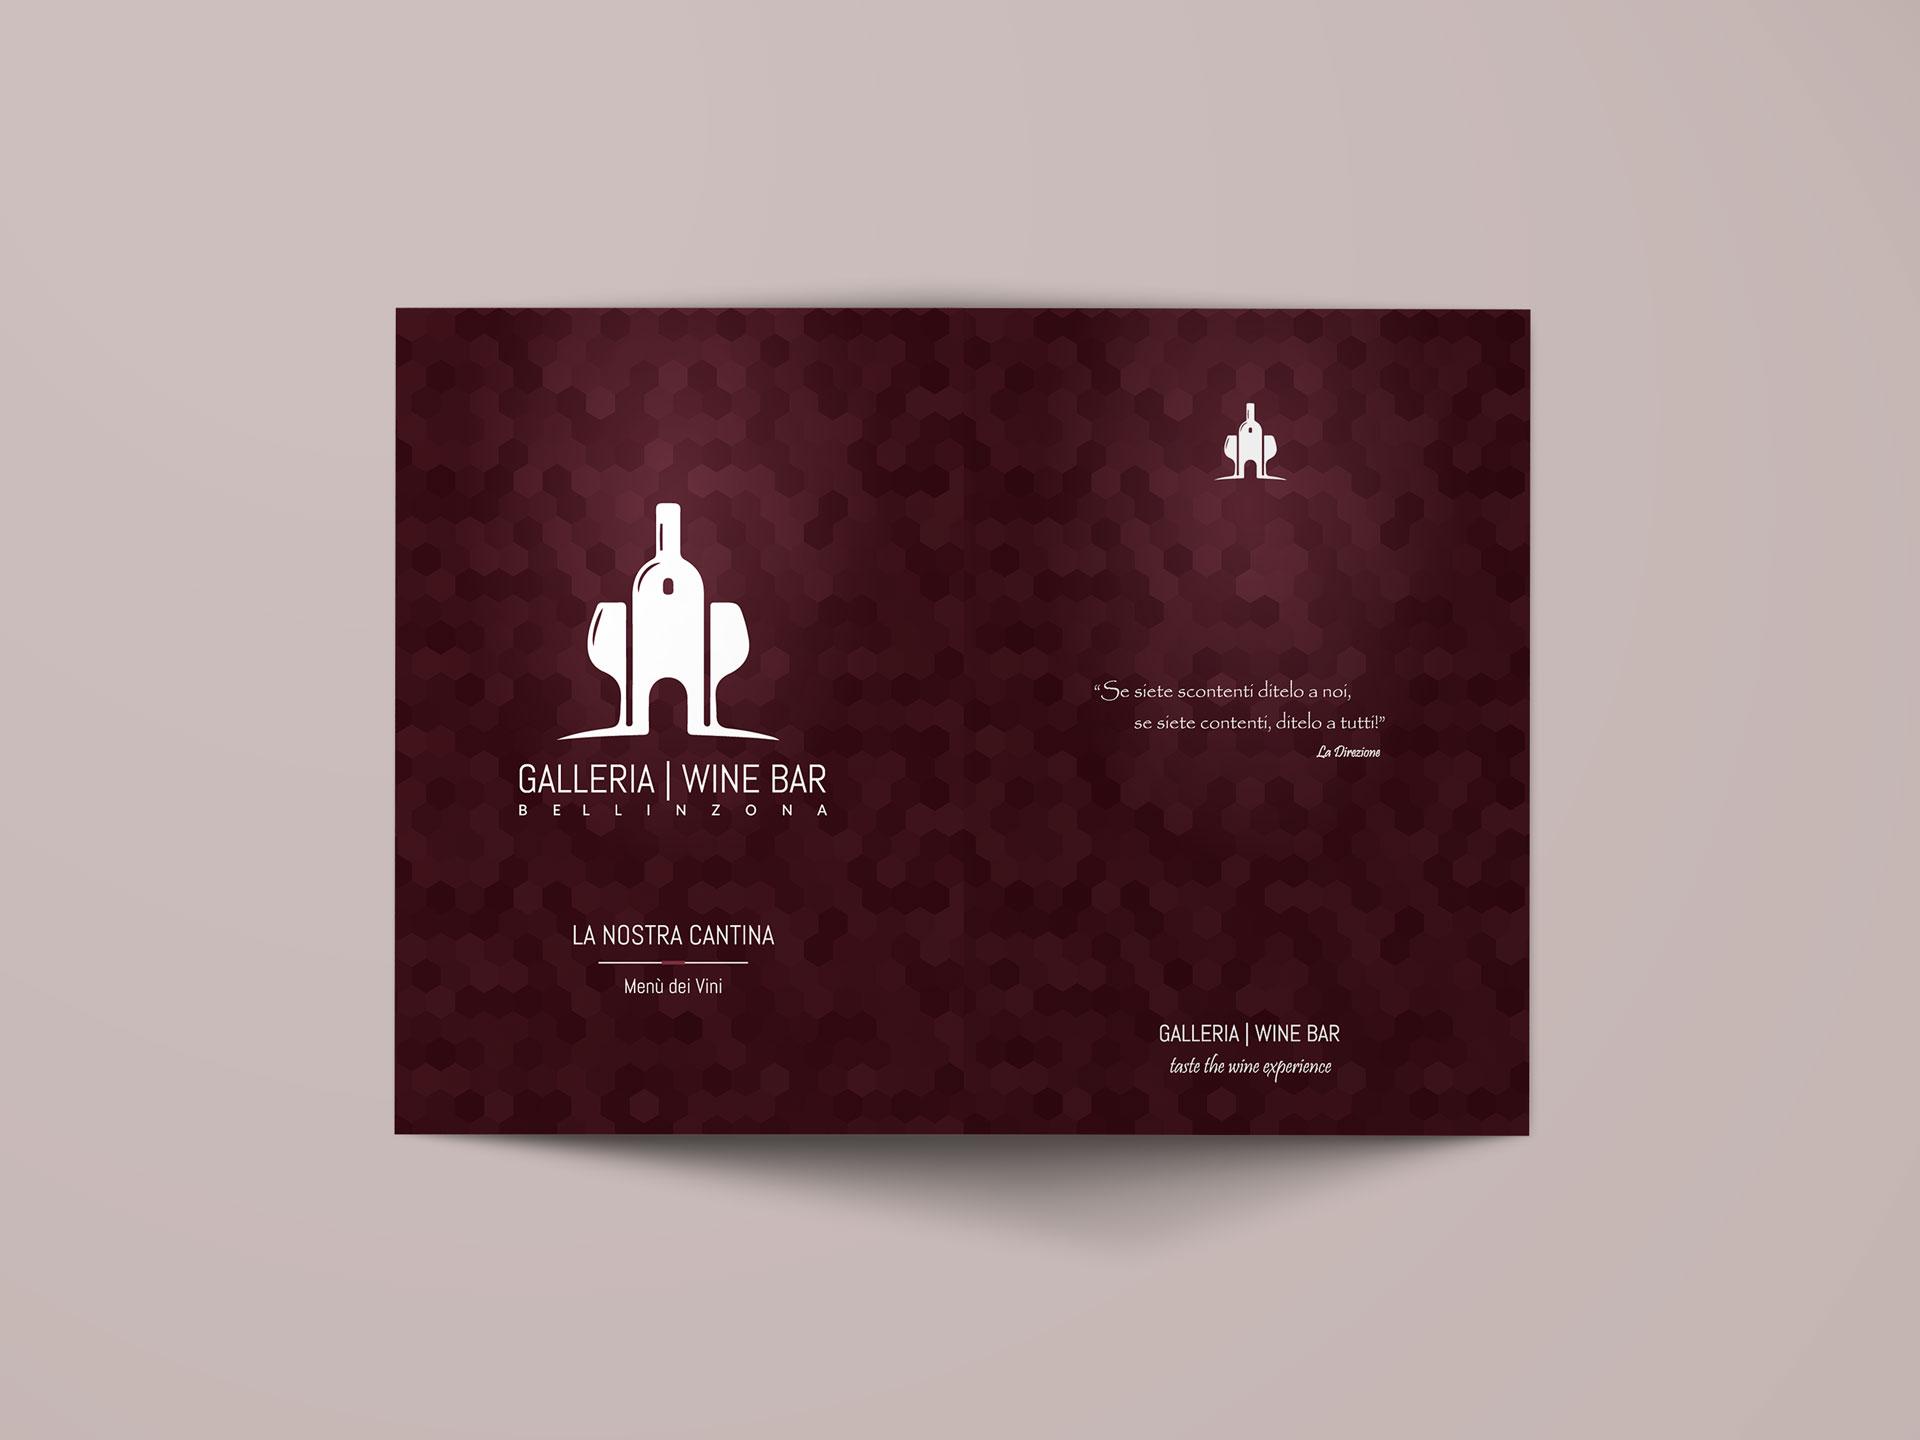 menu-vini-galleria-winebar-bellinzona